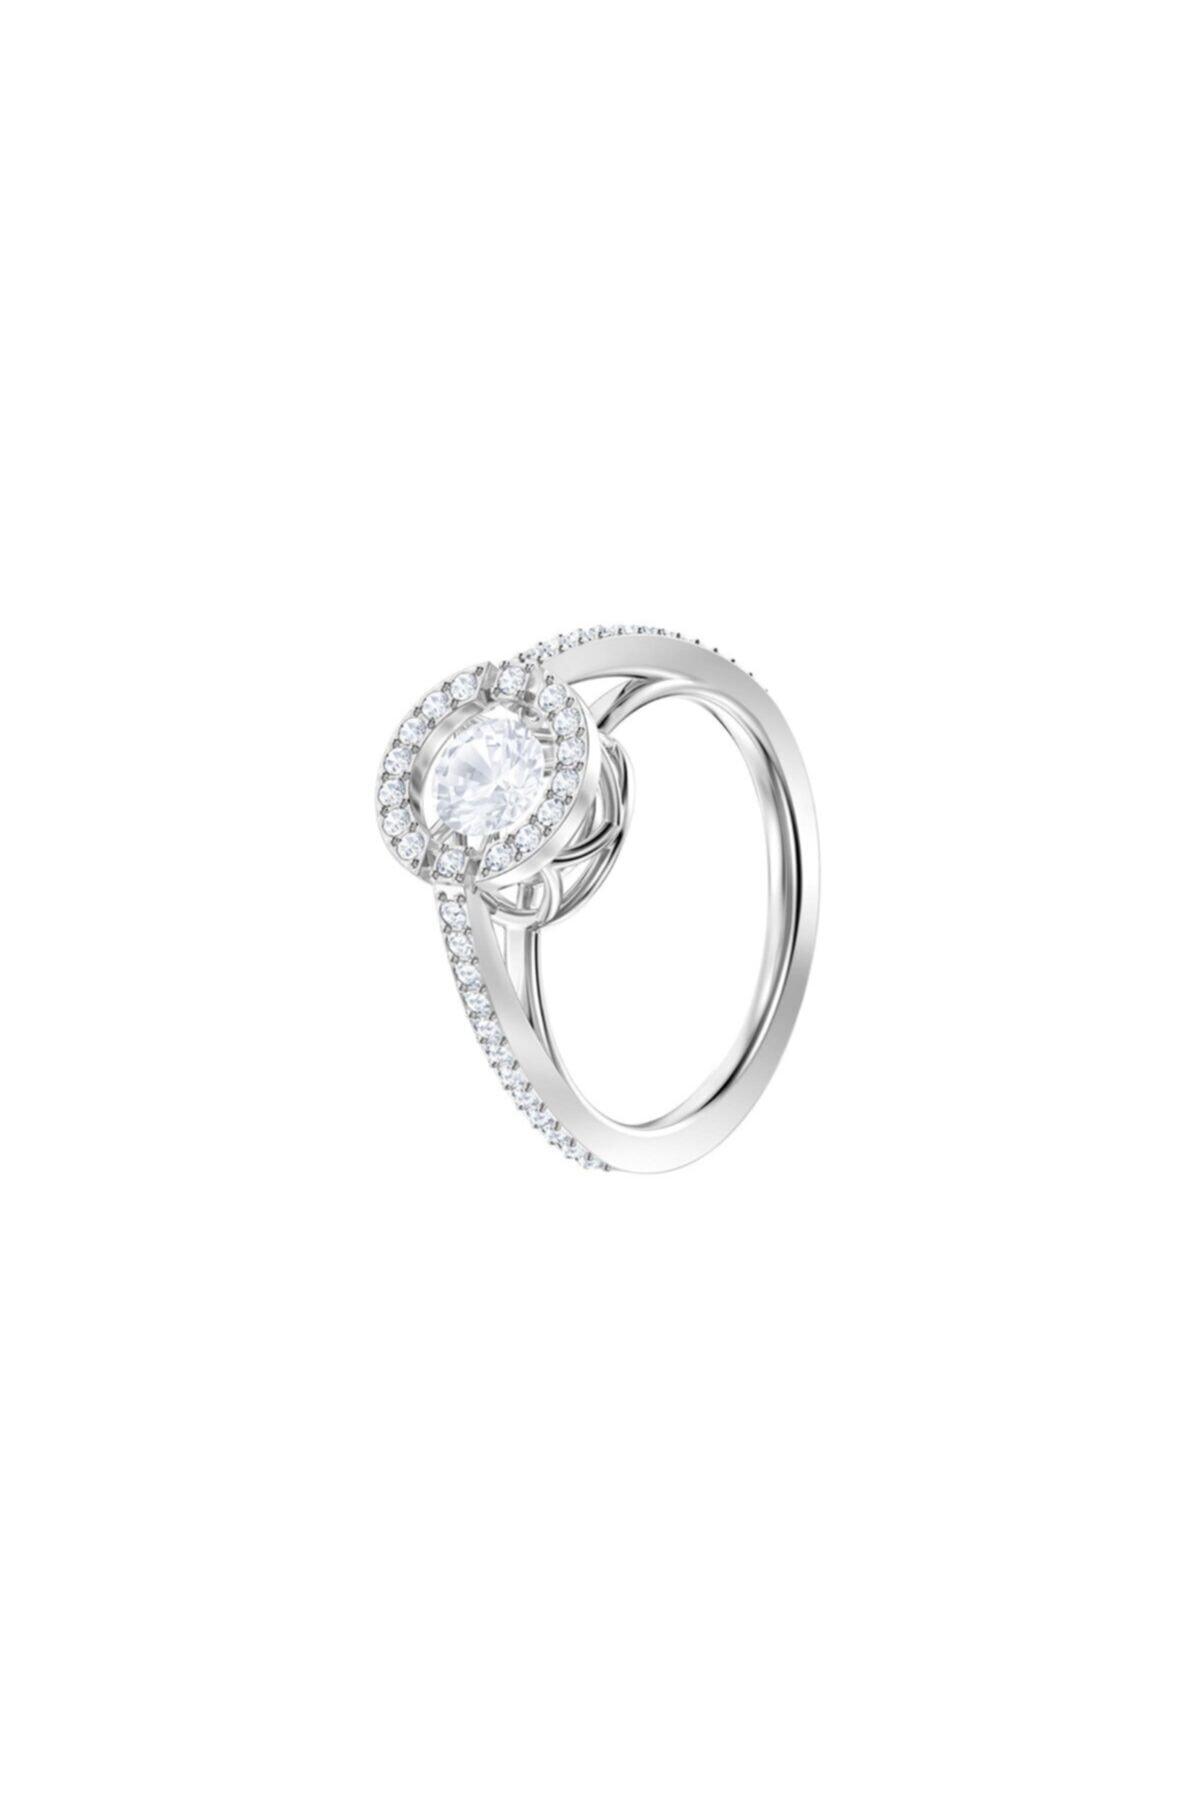 Swarovski Kadın Yüzük Sparkling Dc:Ring Rnd Czwh/Rhs 55 5465280 2